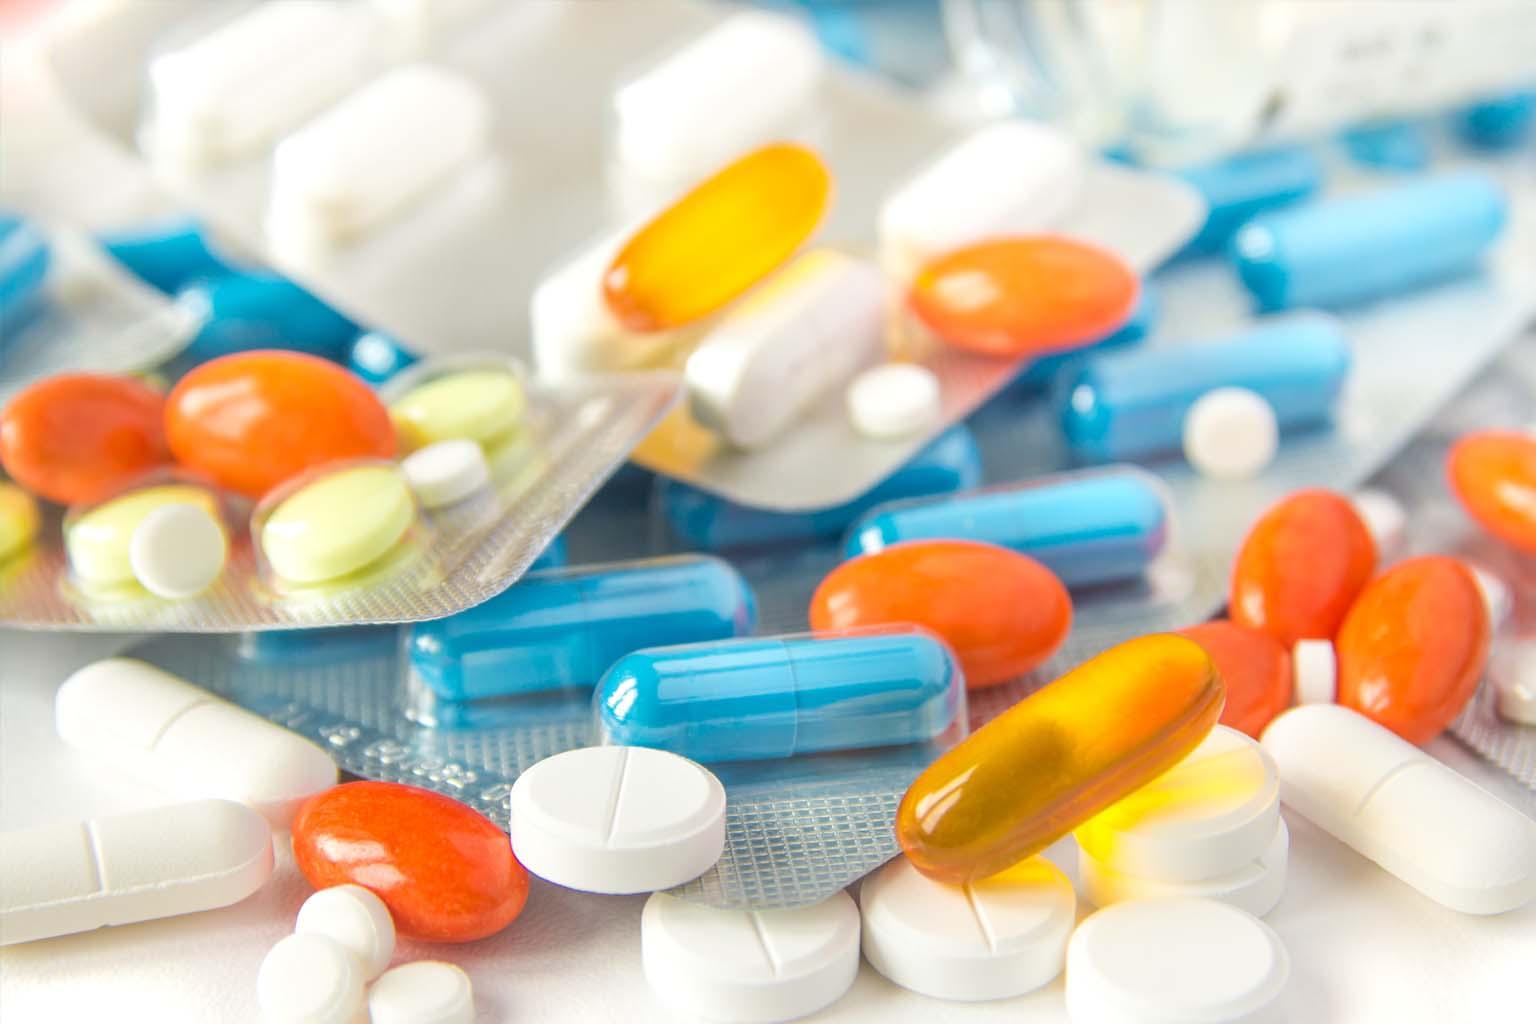 random assortment of pills